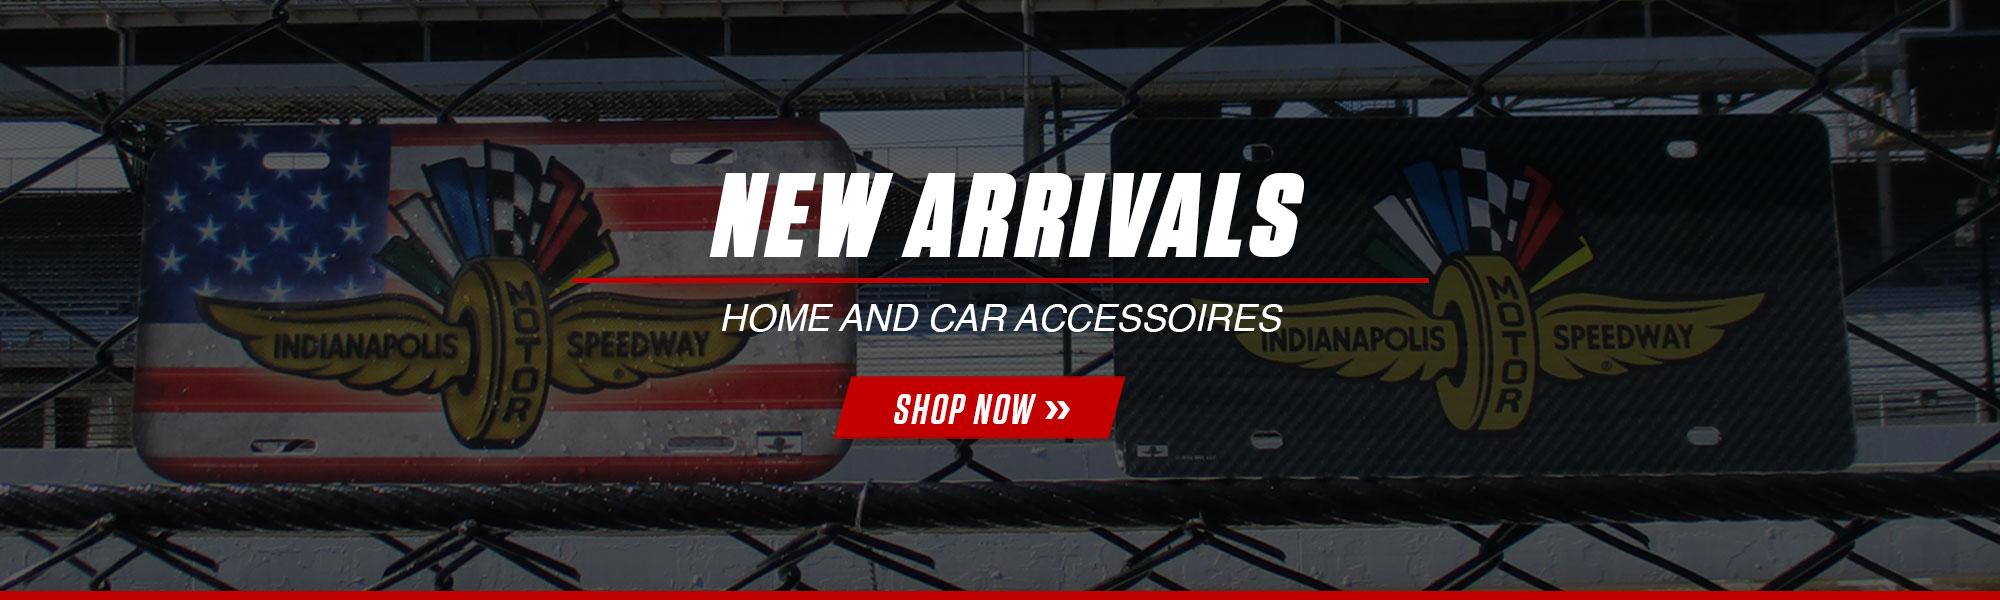 homepage-ims-new-arrivals-2-2019.jpg